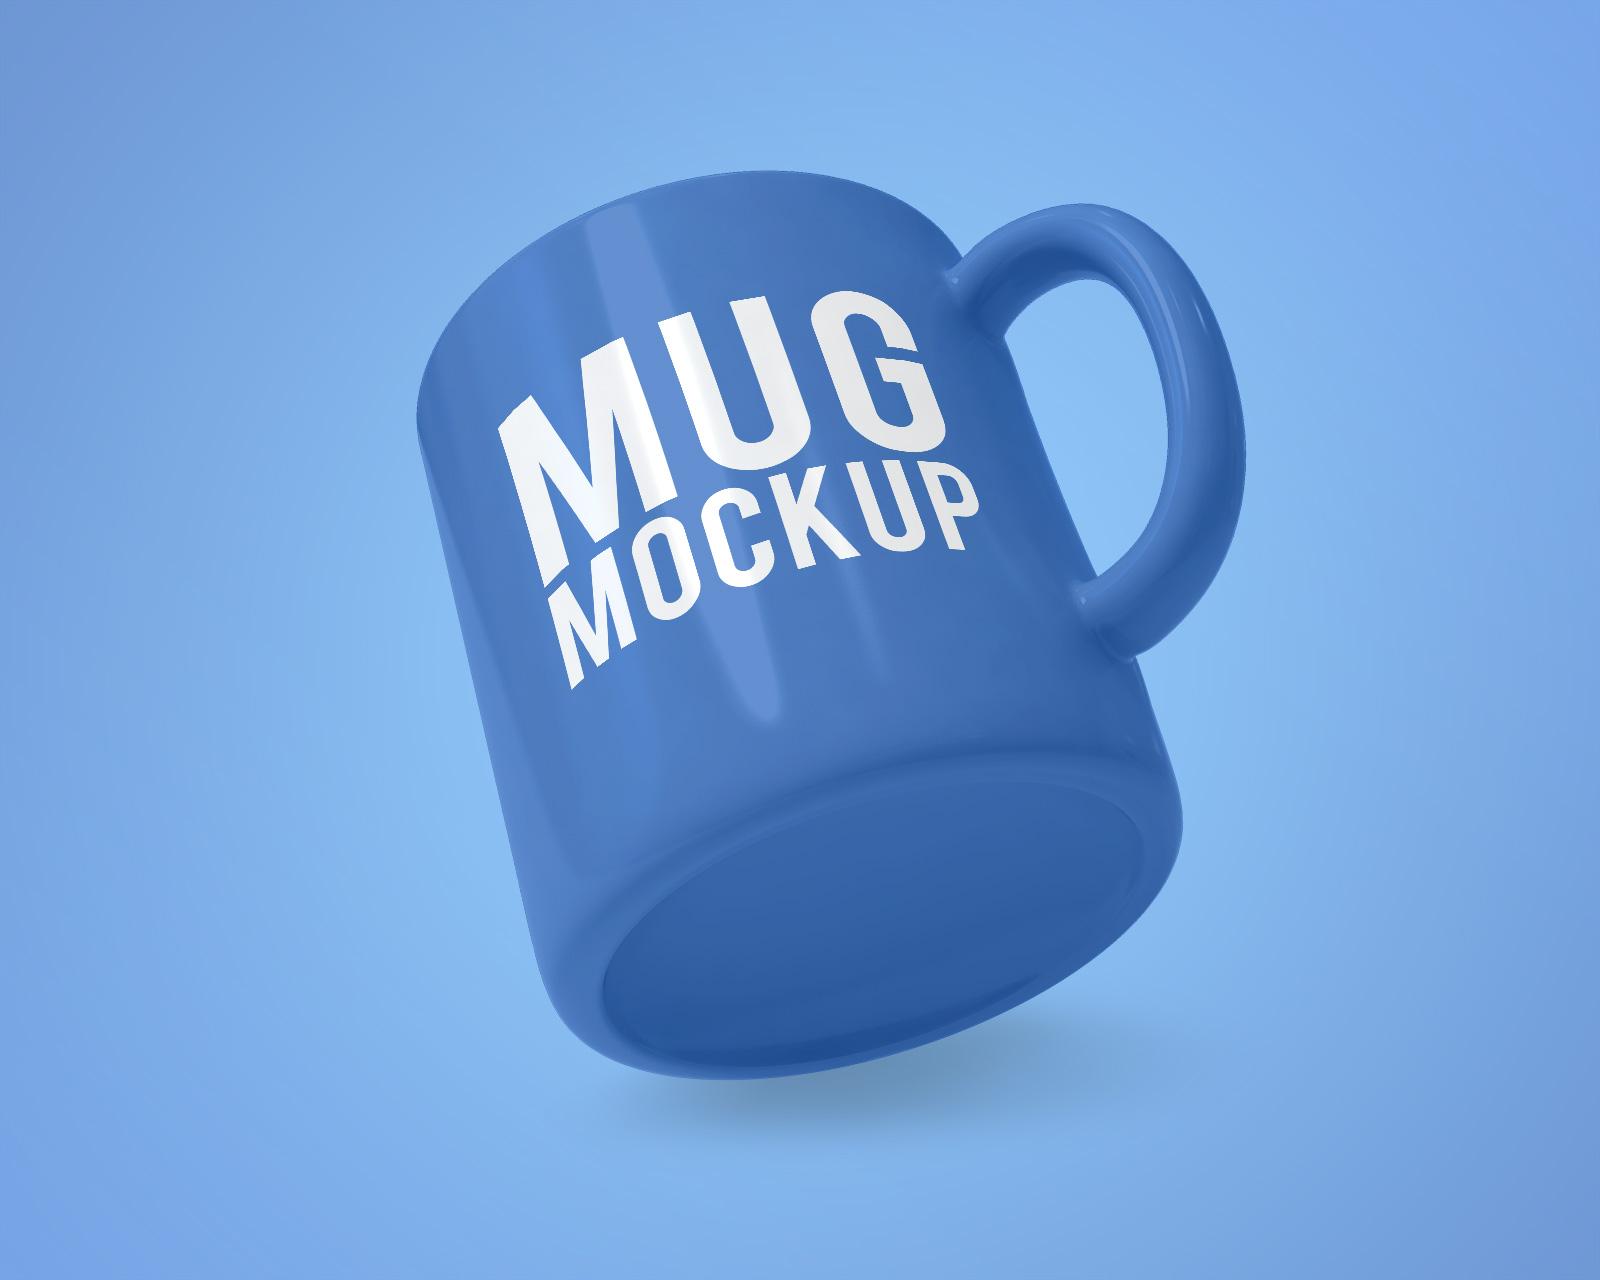 Free-Mug-Mockup-PSD-2